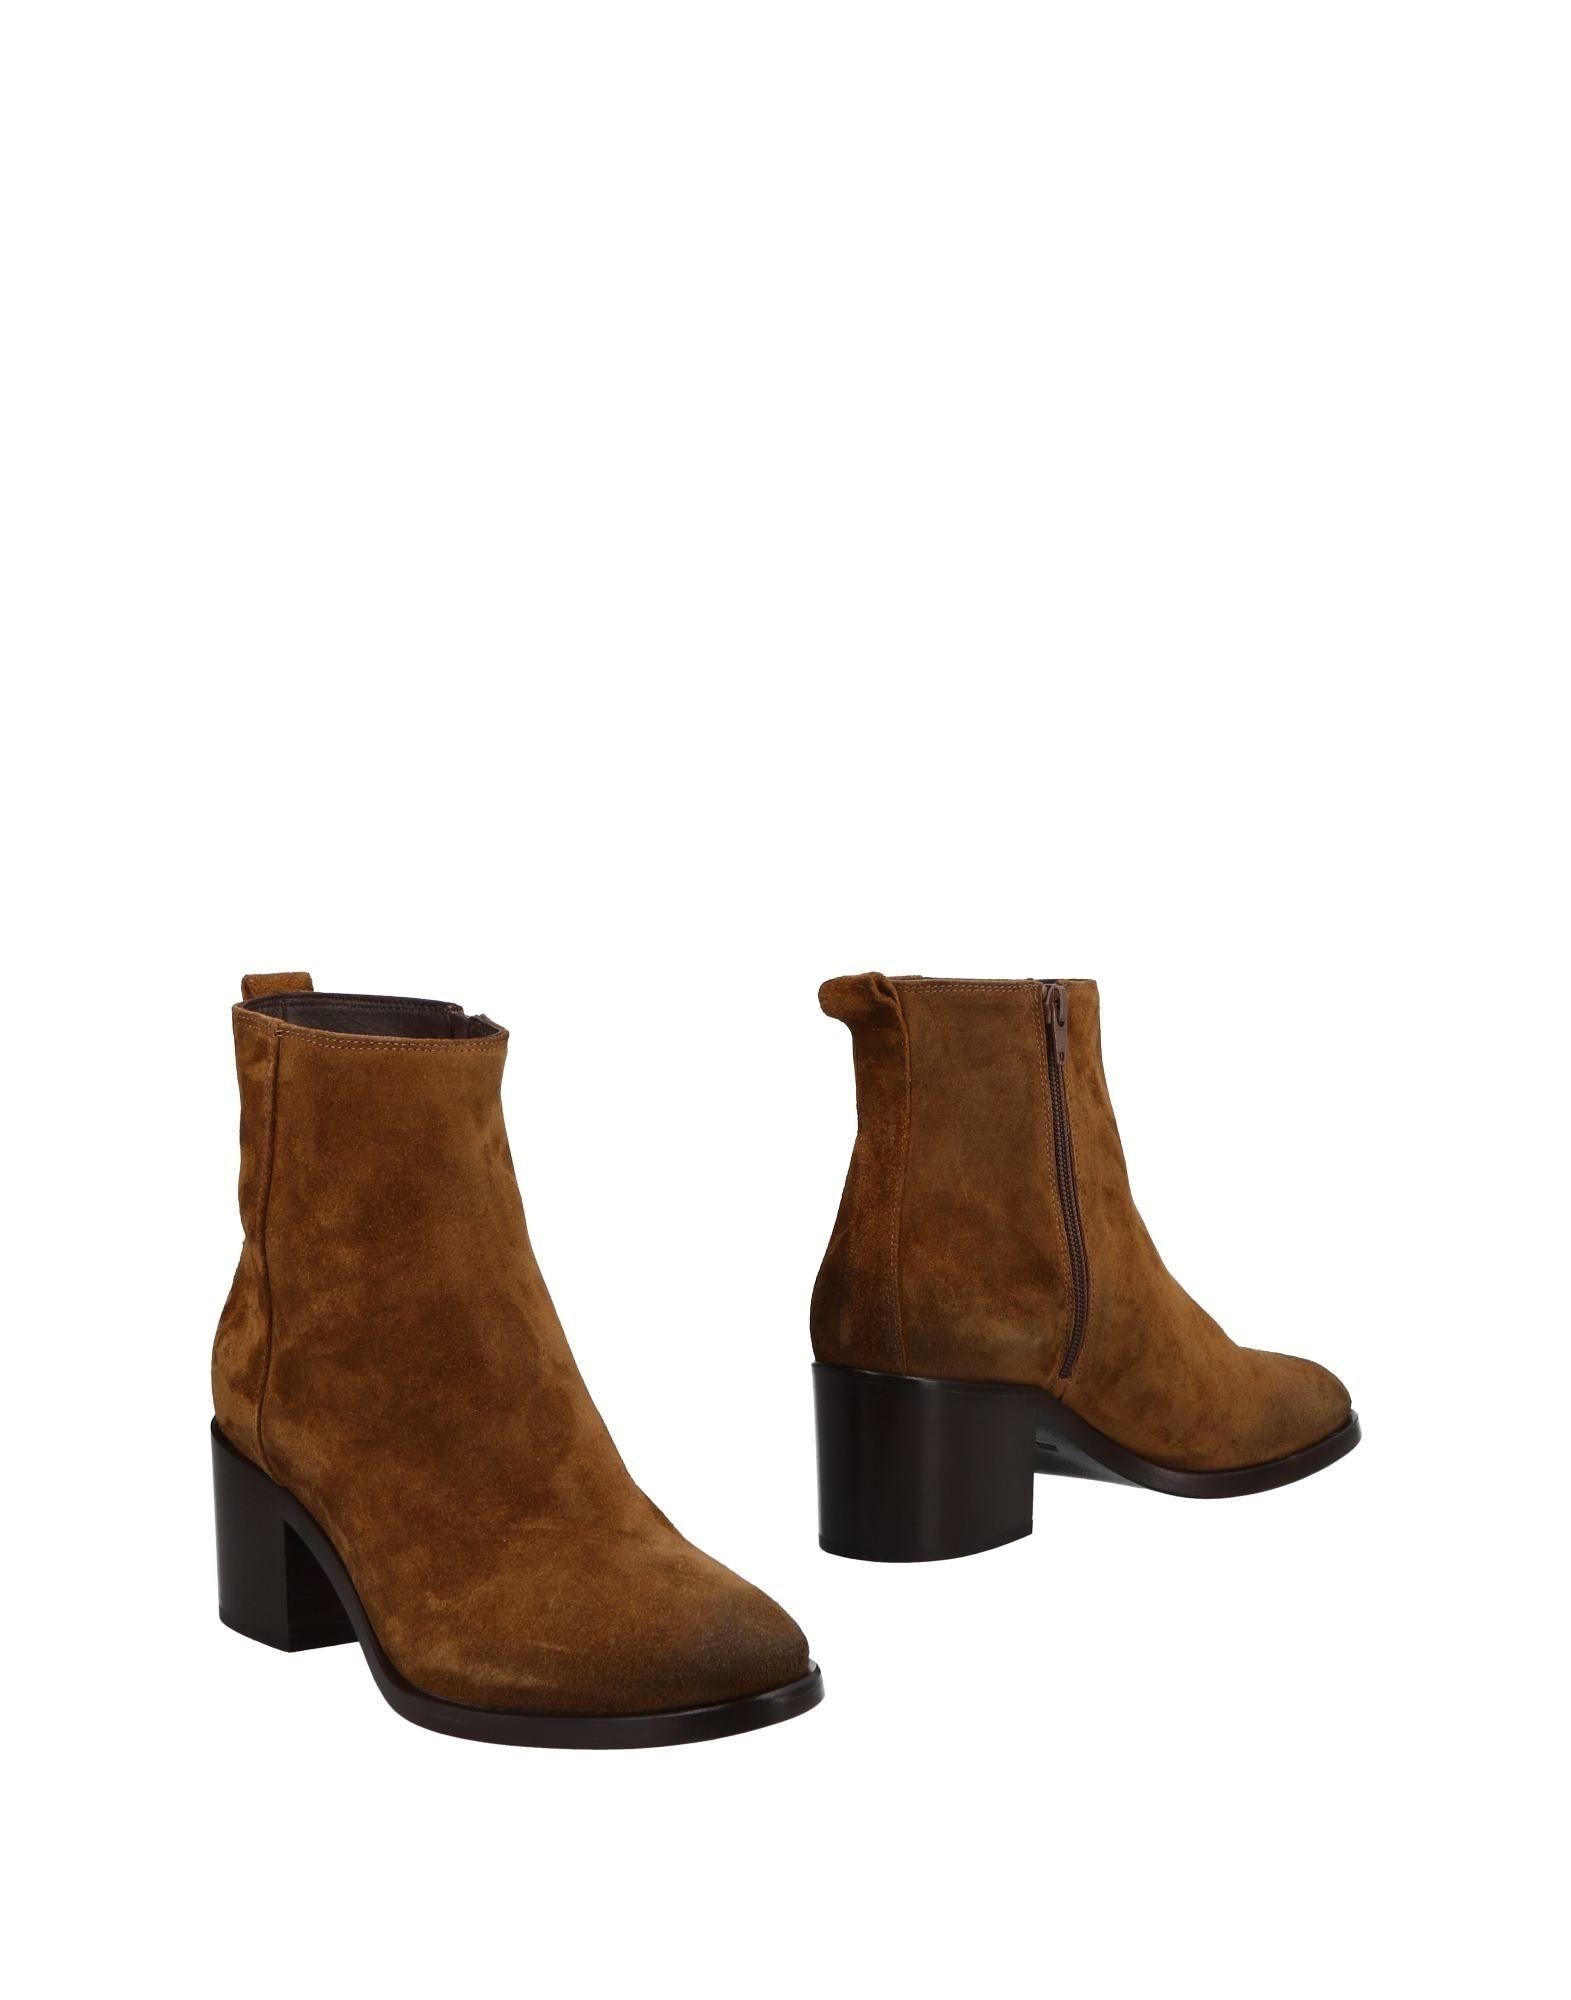 Stilvolle Strategia billige Schuhe Strategia Stilvolle Stiefelette Damen  11502771CV 3248cc